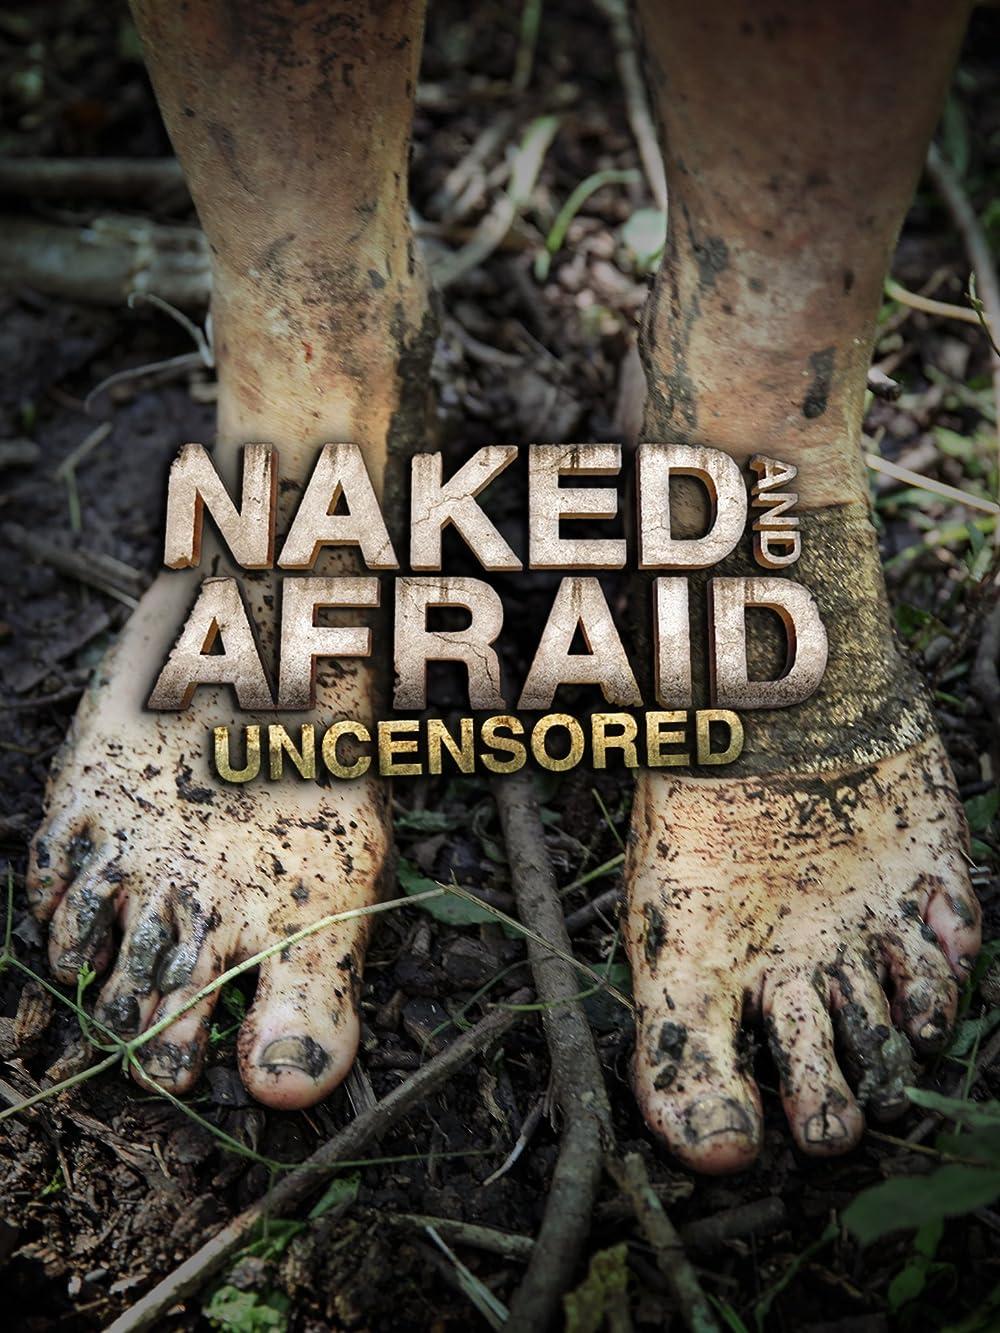 Naked And Afraid Uncensored? photo 27